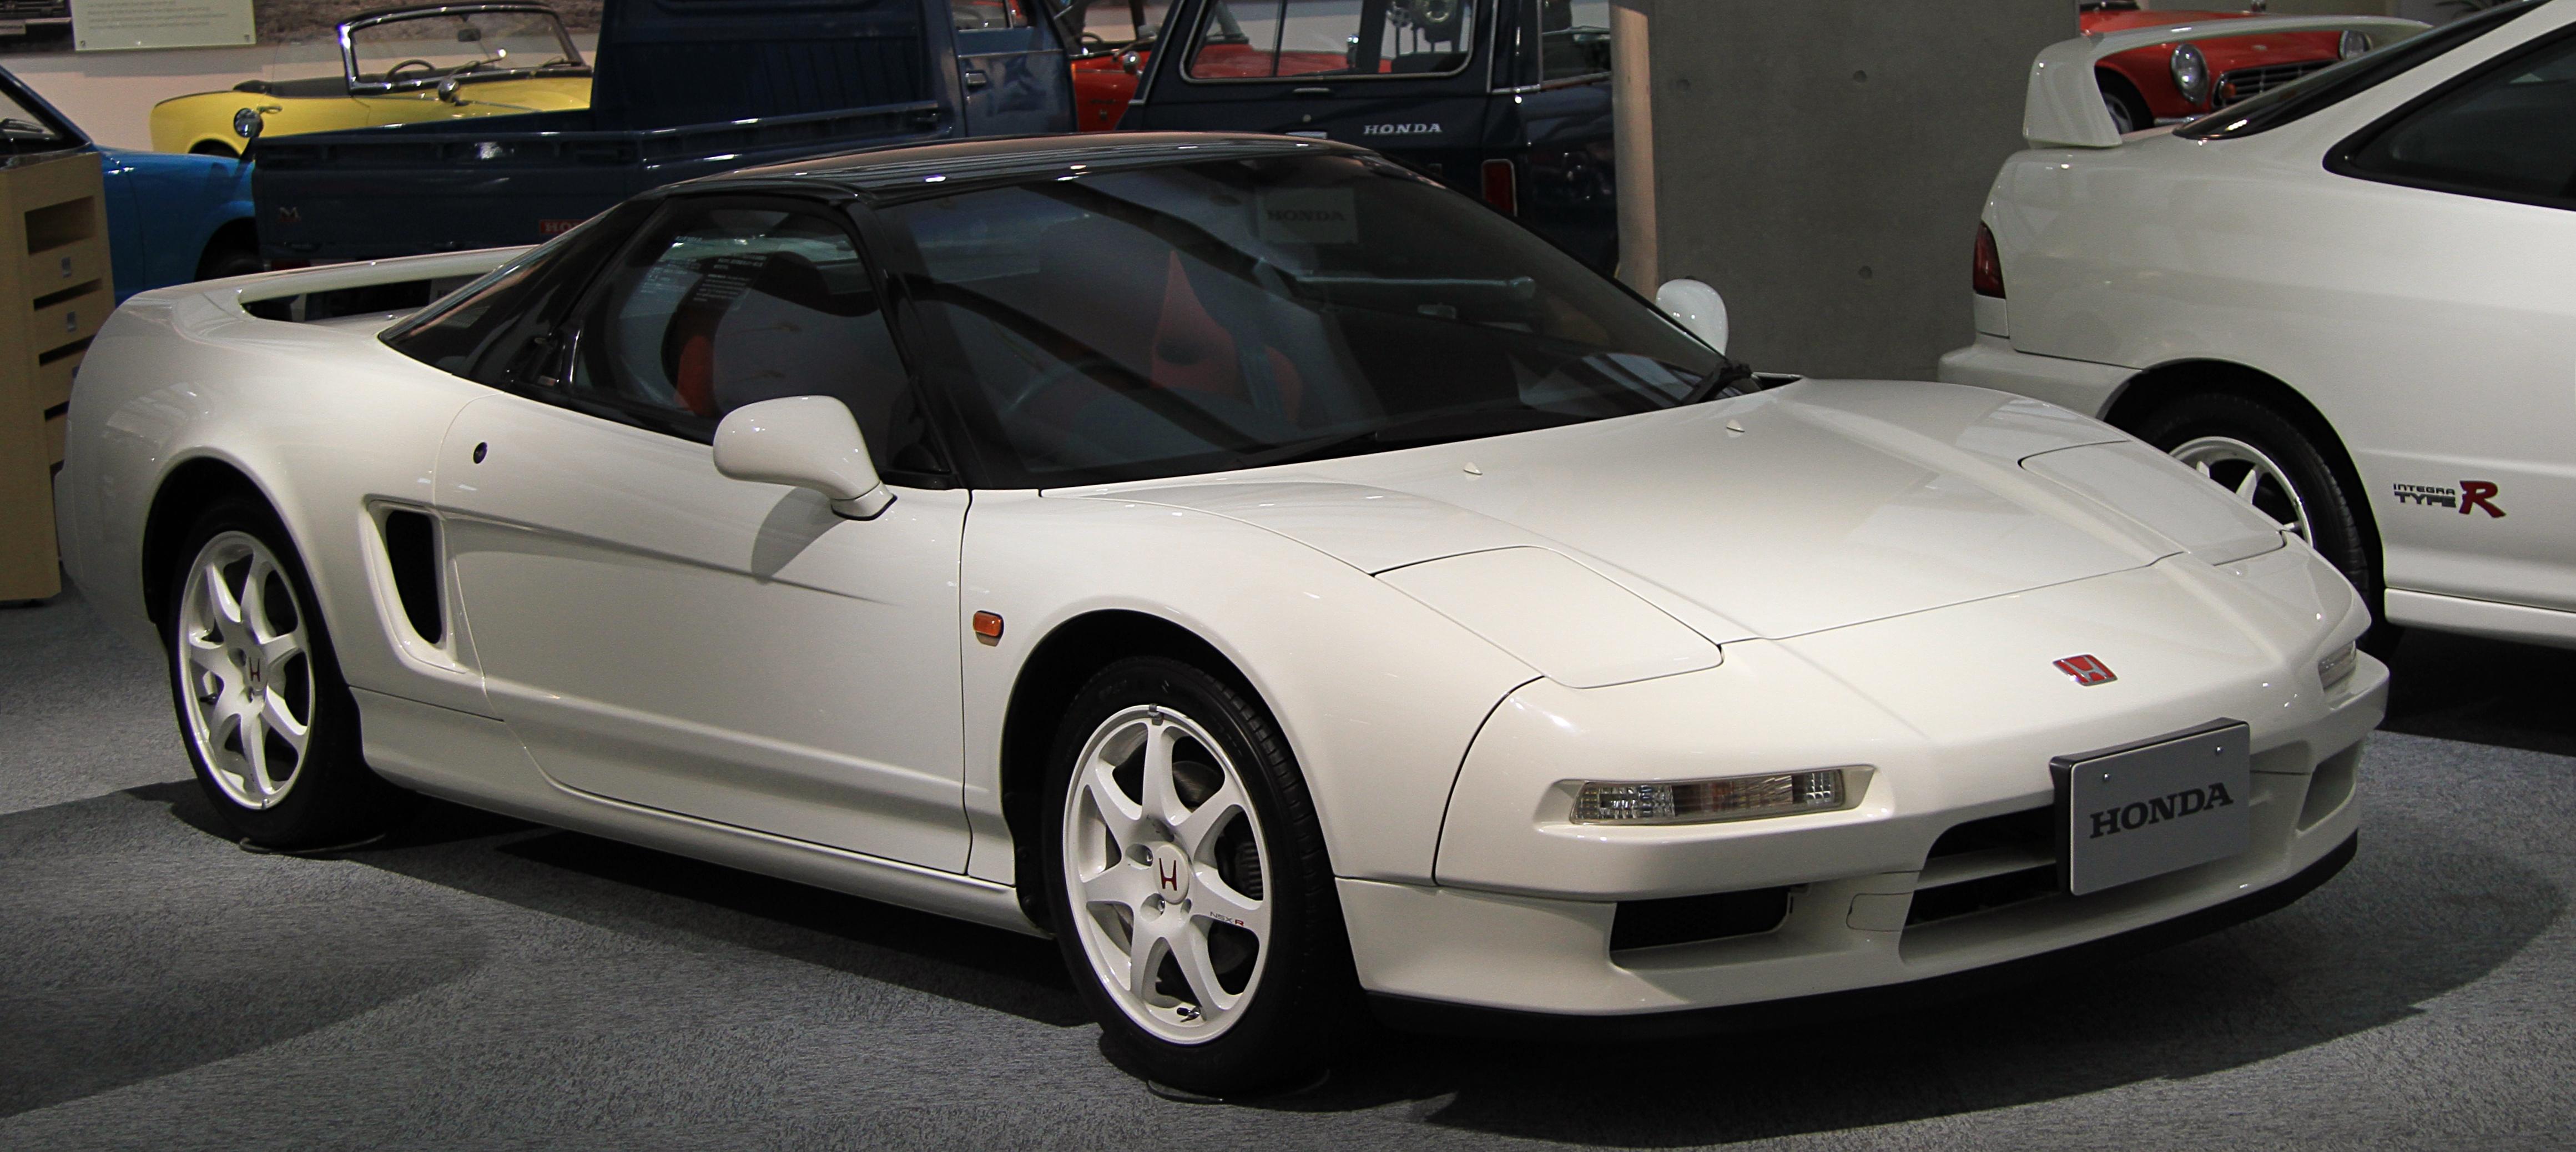 vtecuila honda nsx first generation 1990 2005 Acura NSX Drivetrain acura nsx manual transmission for sale